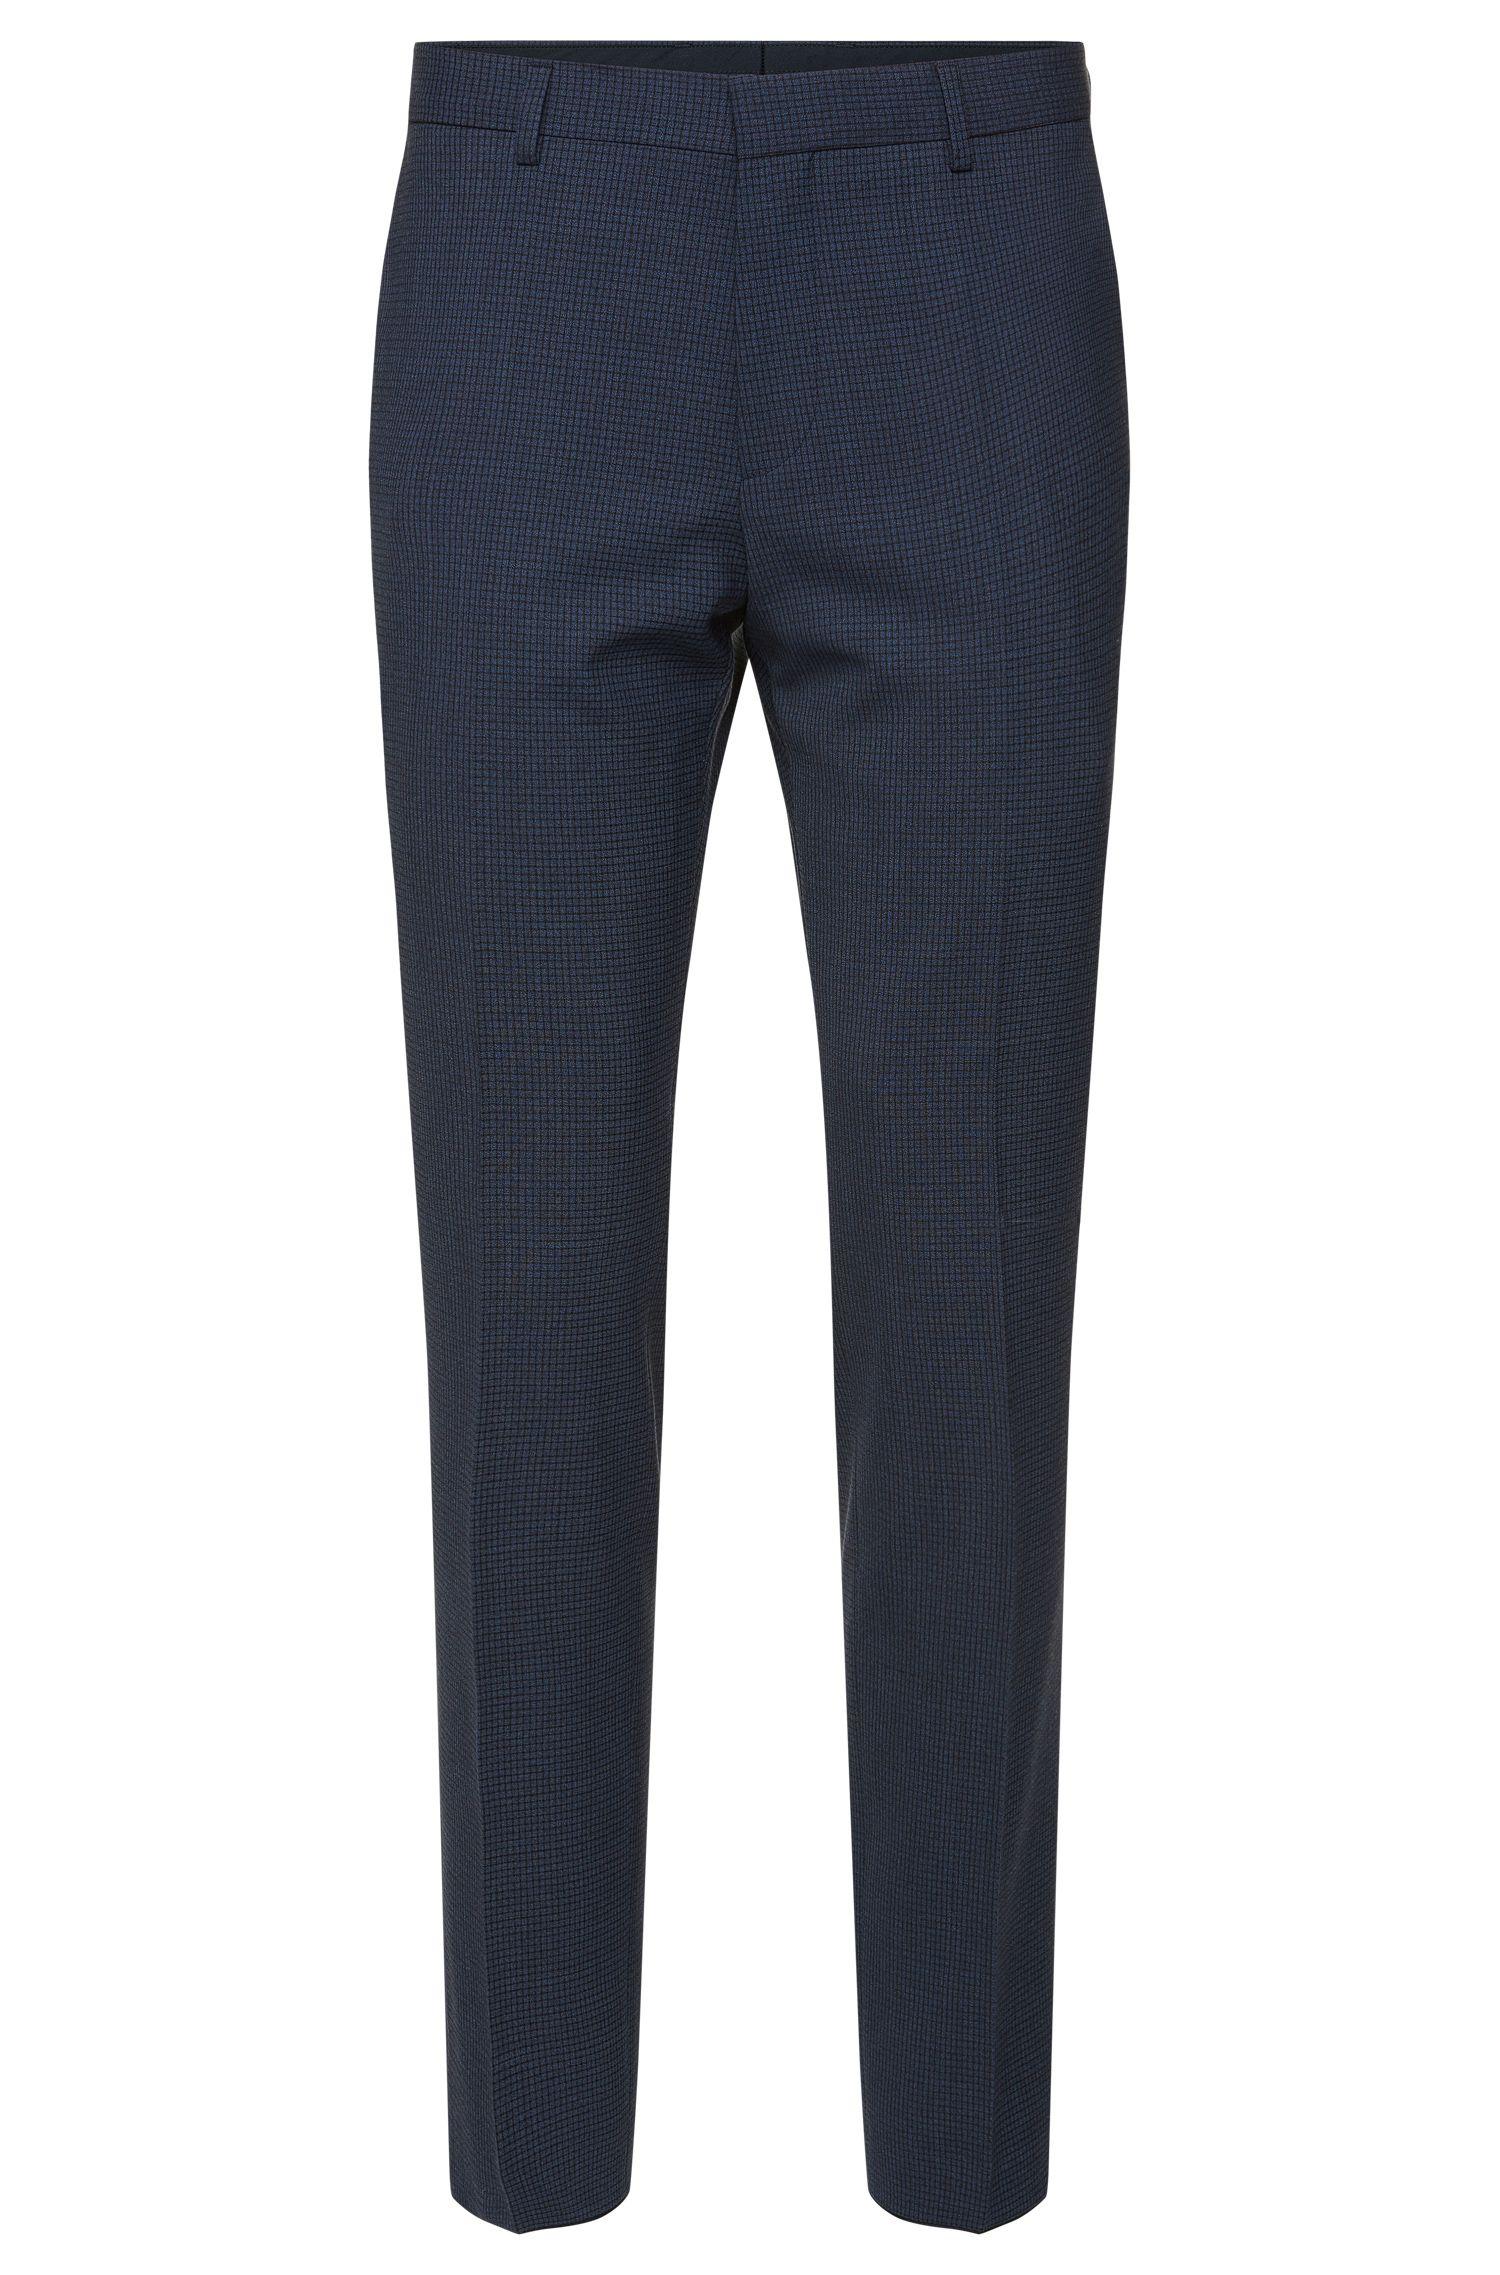 'Genesis'   Slim Fit, Stretch Wool Blend Check Dress Pants